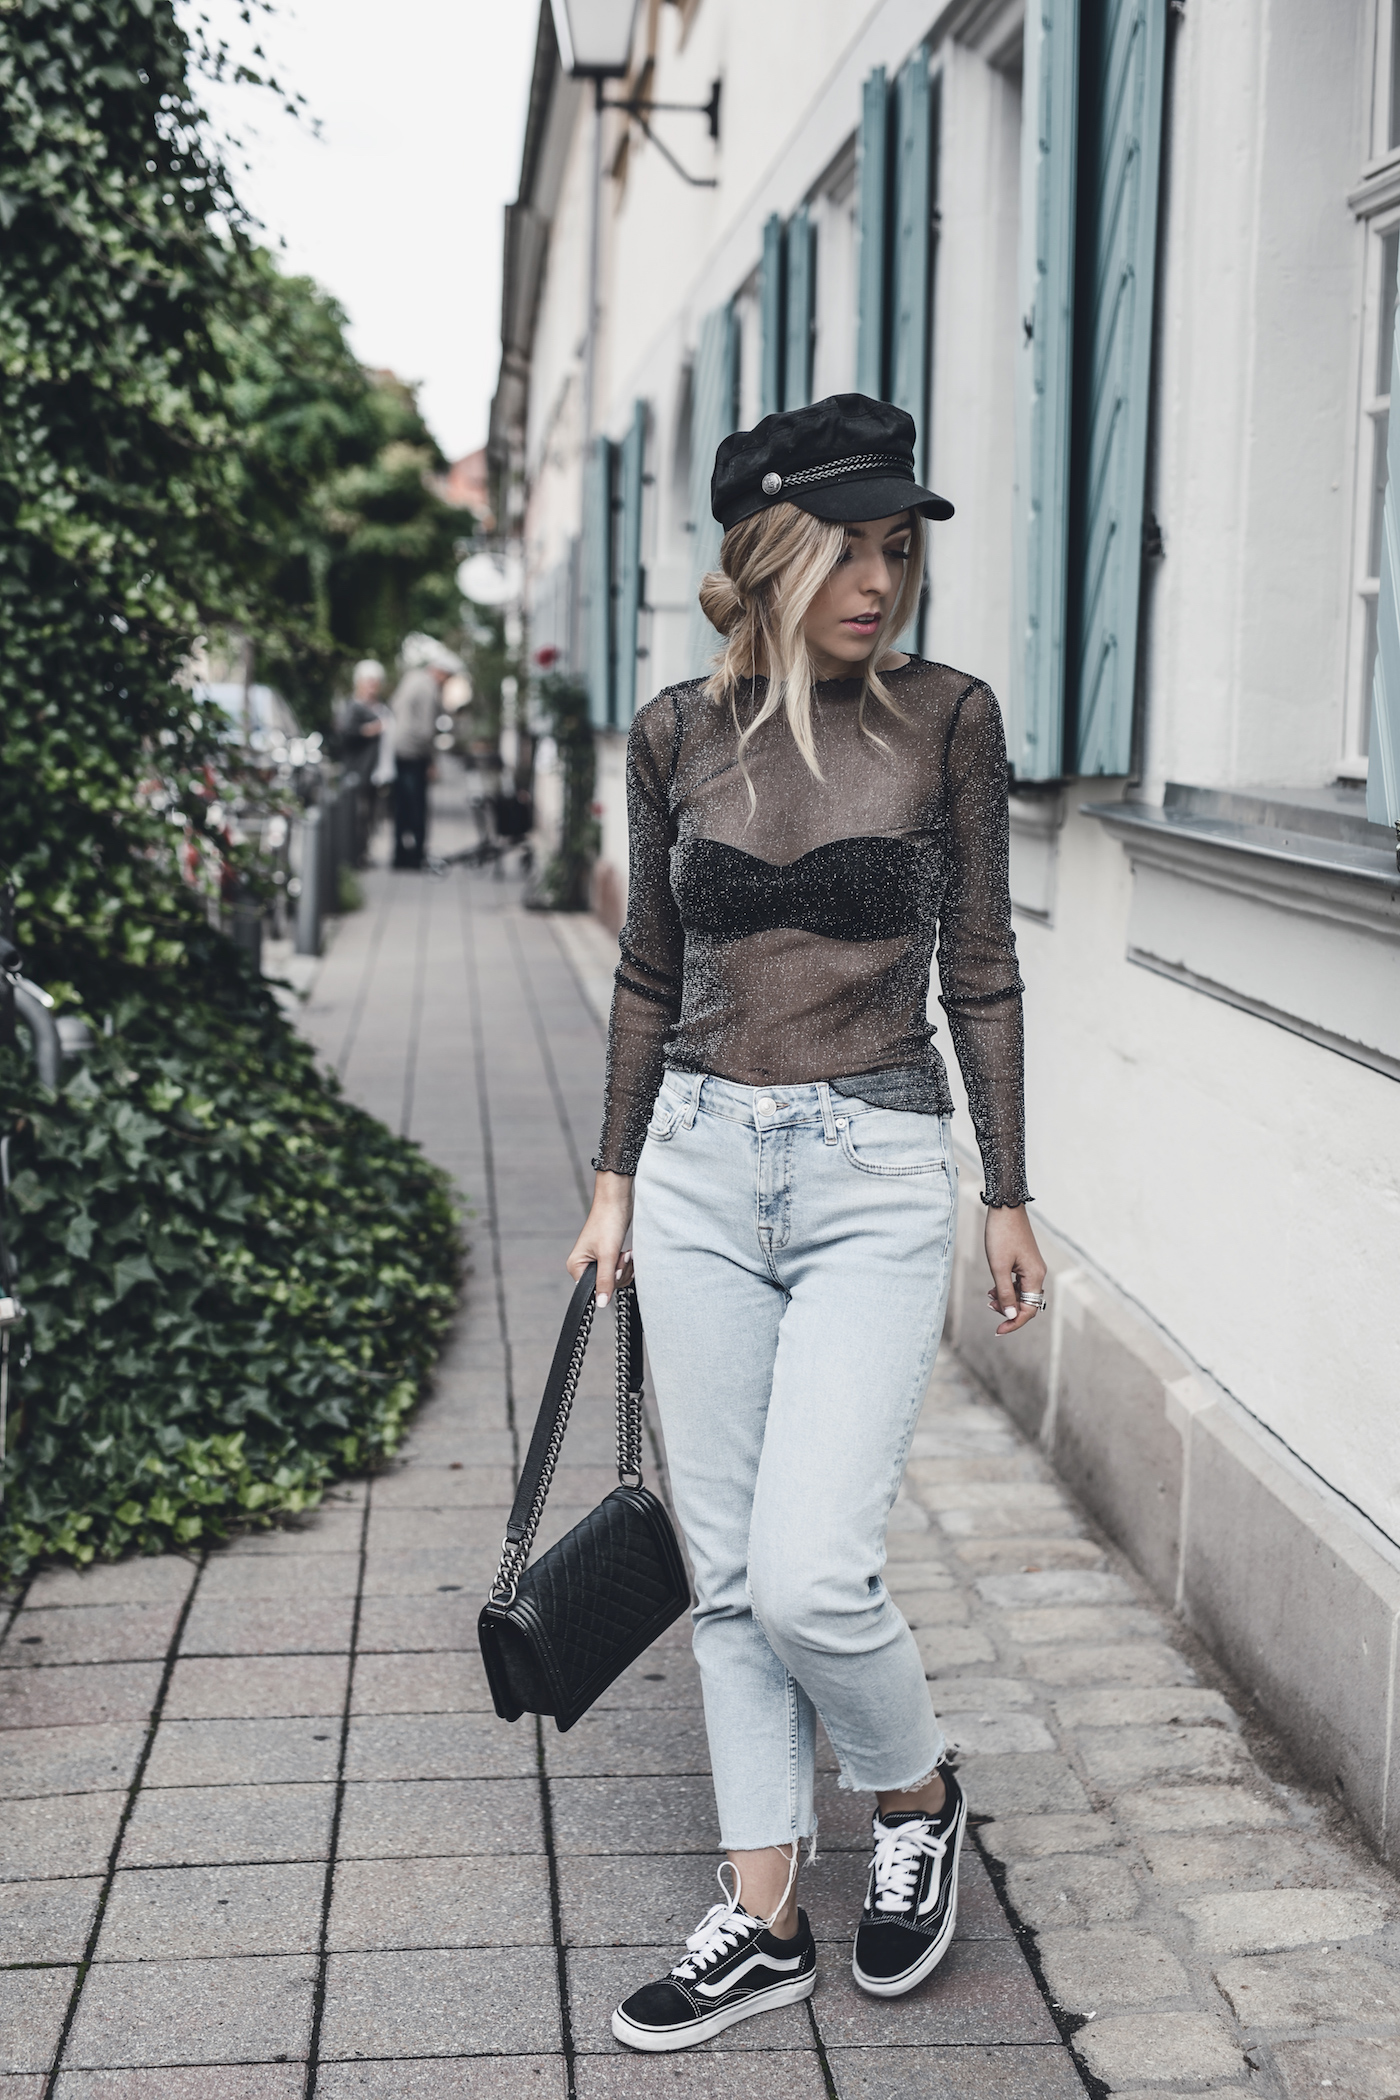 Baker Boy Hat Trend 2017 Fall Autumn Outfit Ideas | Want Get Repeat Fashion Blog Mode Blog Erlangen Nürnberg Bayern